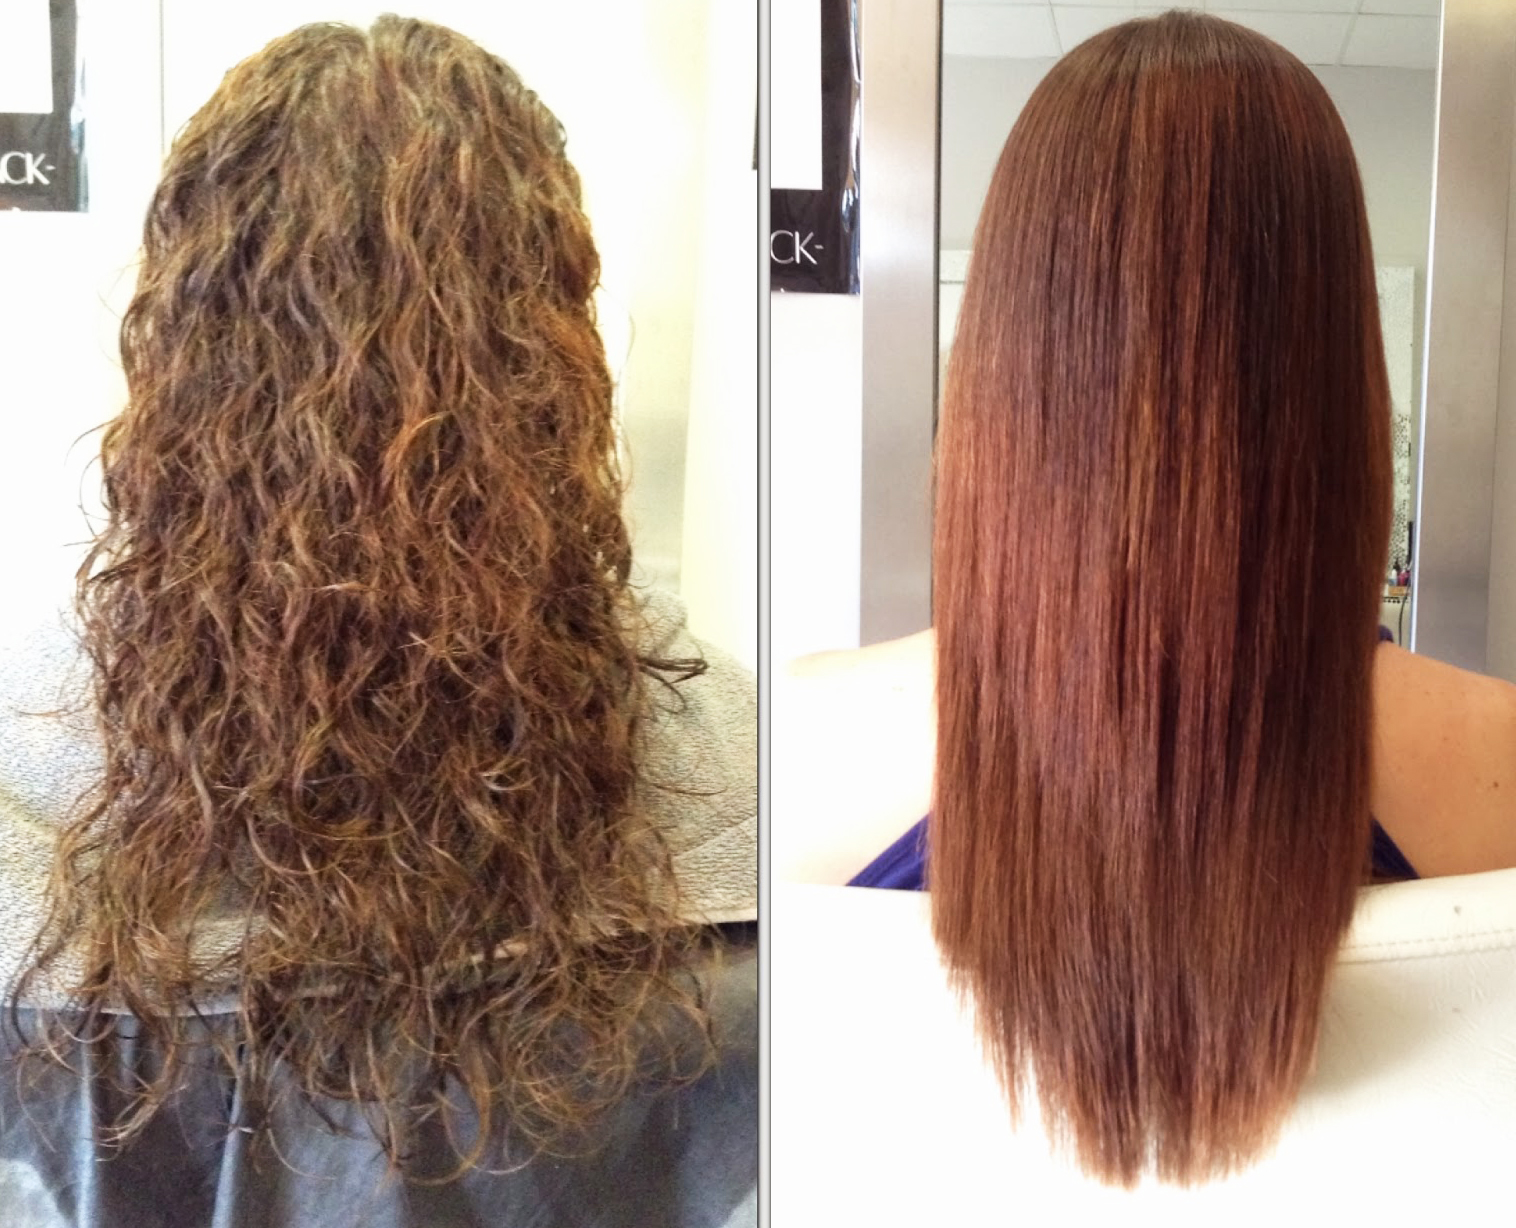 Straight permanent hair - Permanent_hair_straightening_brisbane